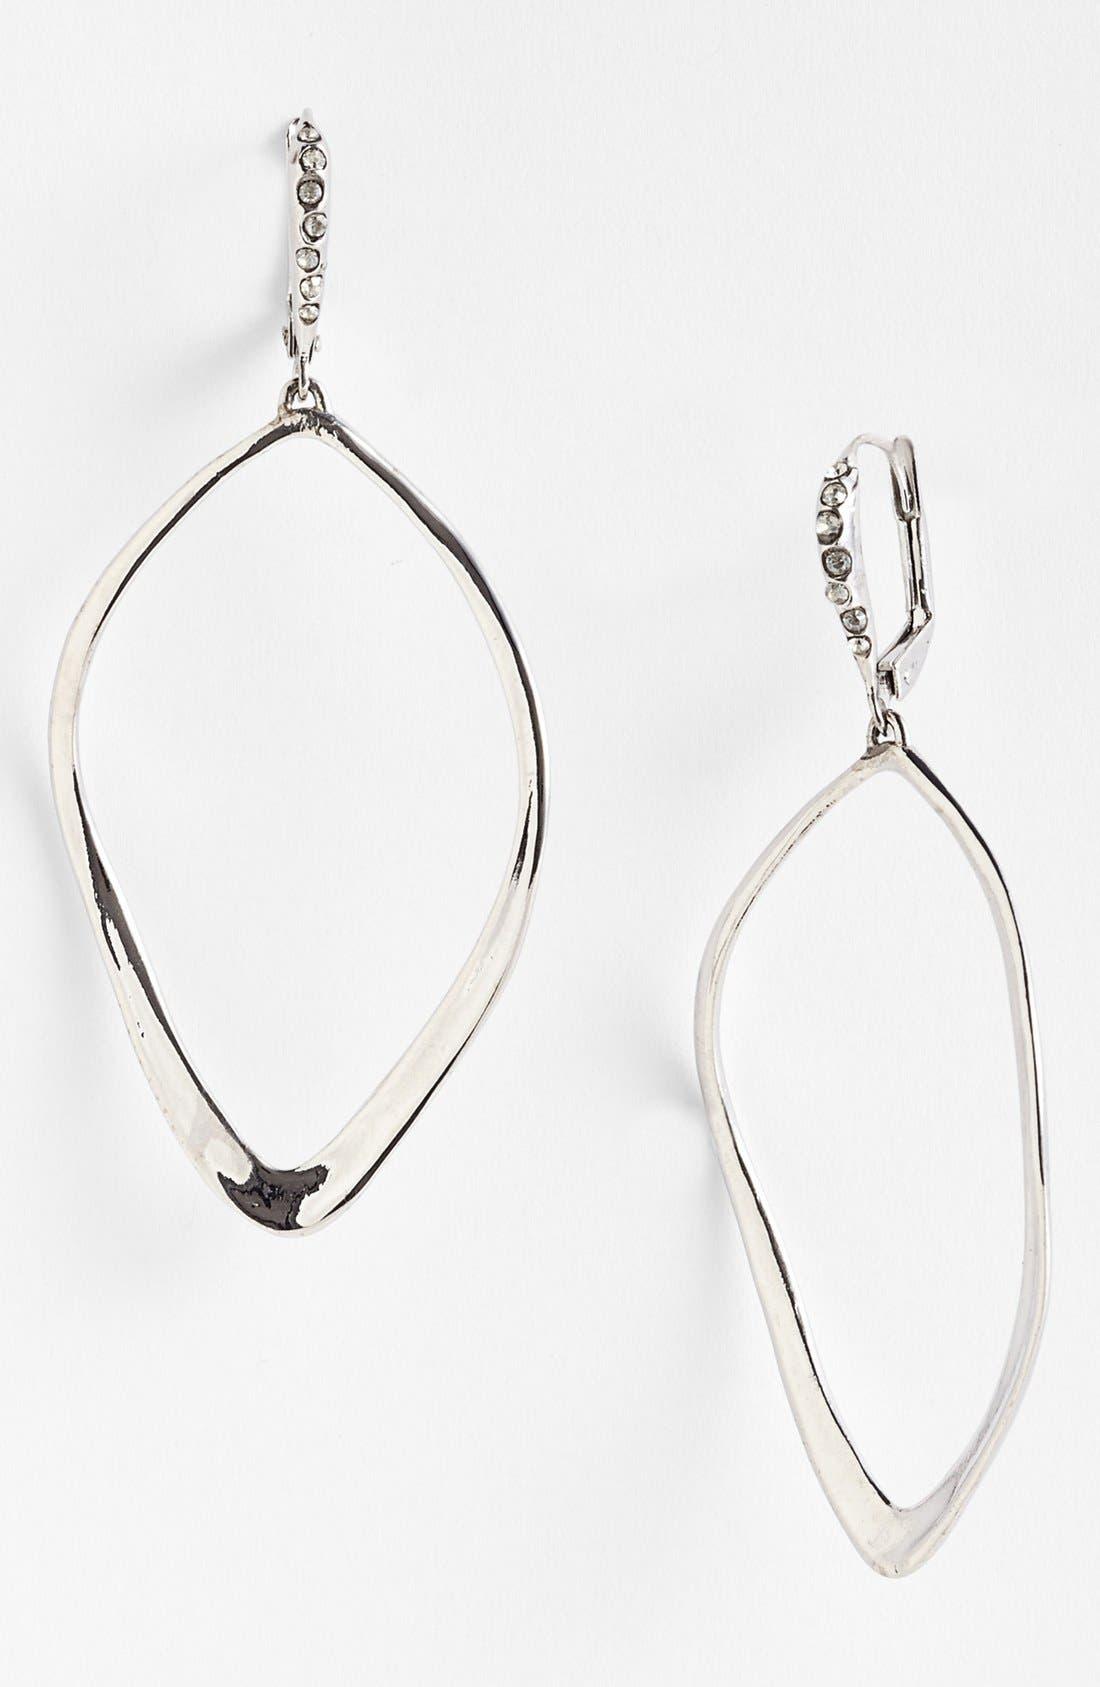 Alternate Image 1 Selected - Alexis Bittar 'Miss Havisham' Open Drop Earrings